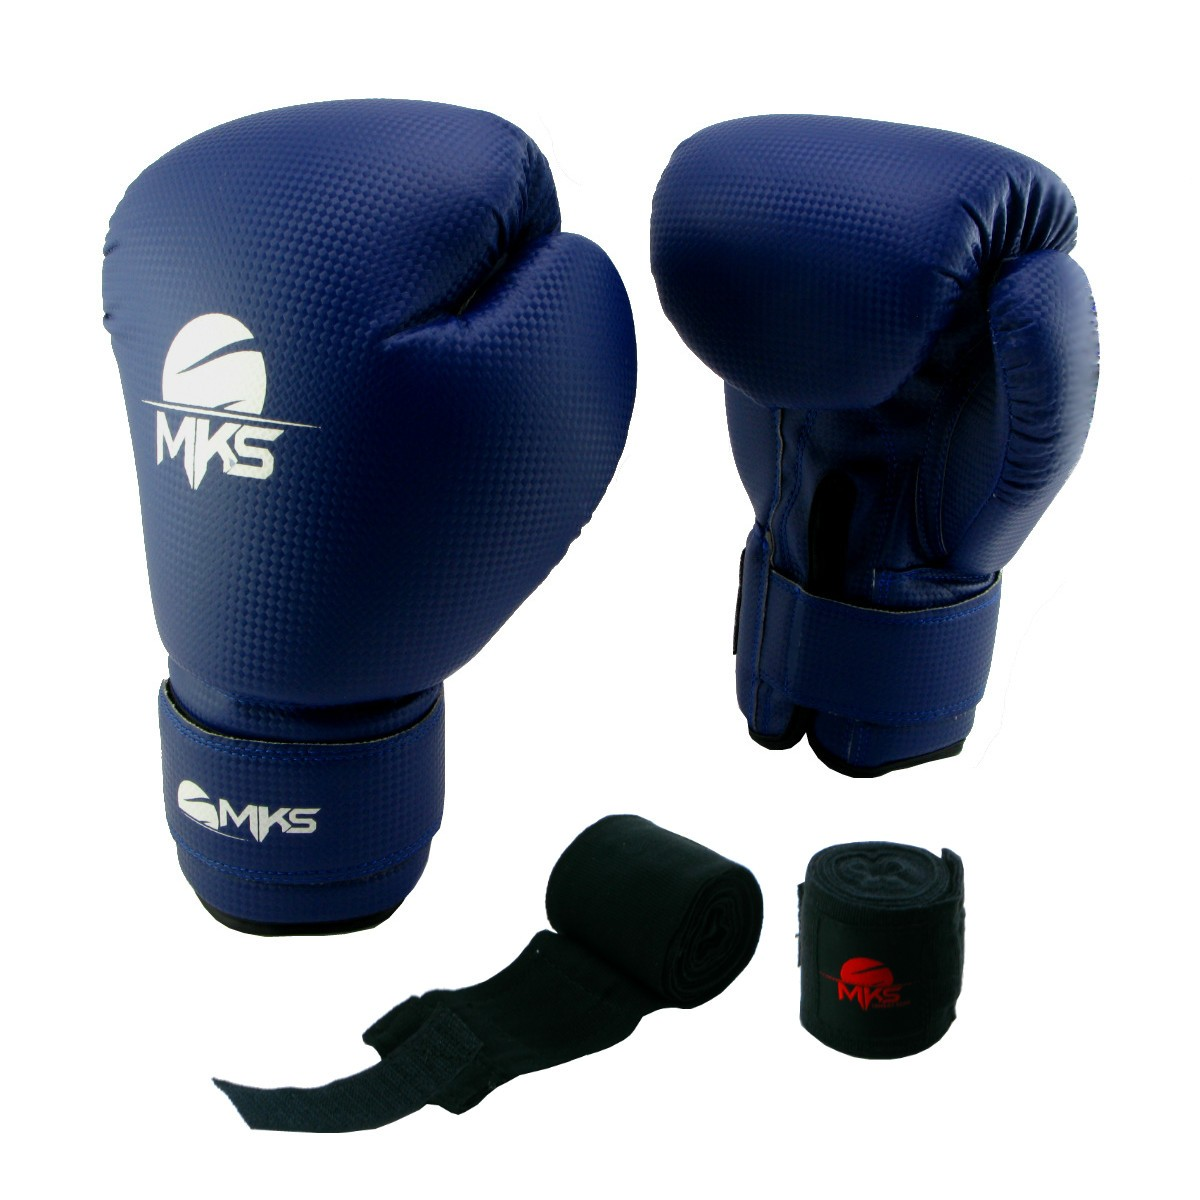 Luva de Boxe Prospect MKS Blue 16 oz + bandagem